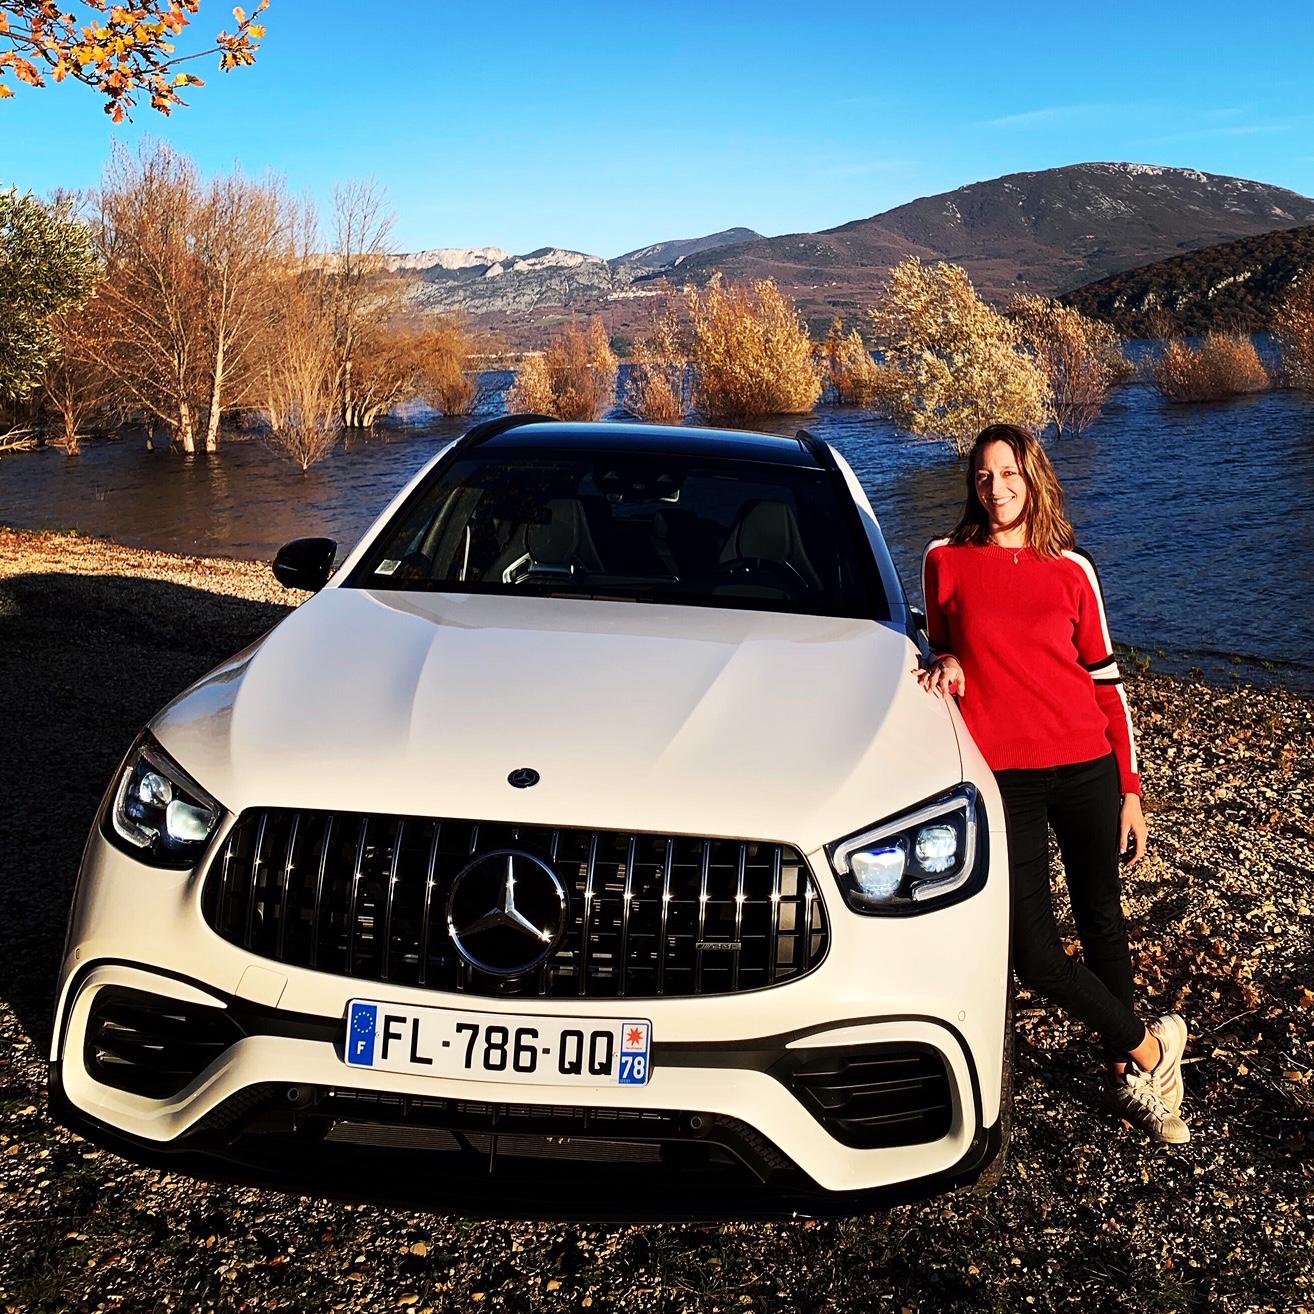 Mercedes AMG GLC 63S, AMG, Mercedes, SUV, SUV premium, SUV sport, GLC, essai, testdrive, clemence de bernis